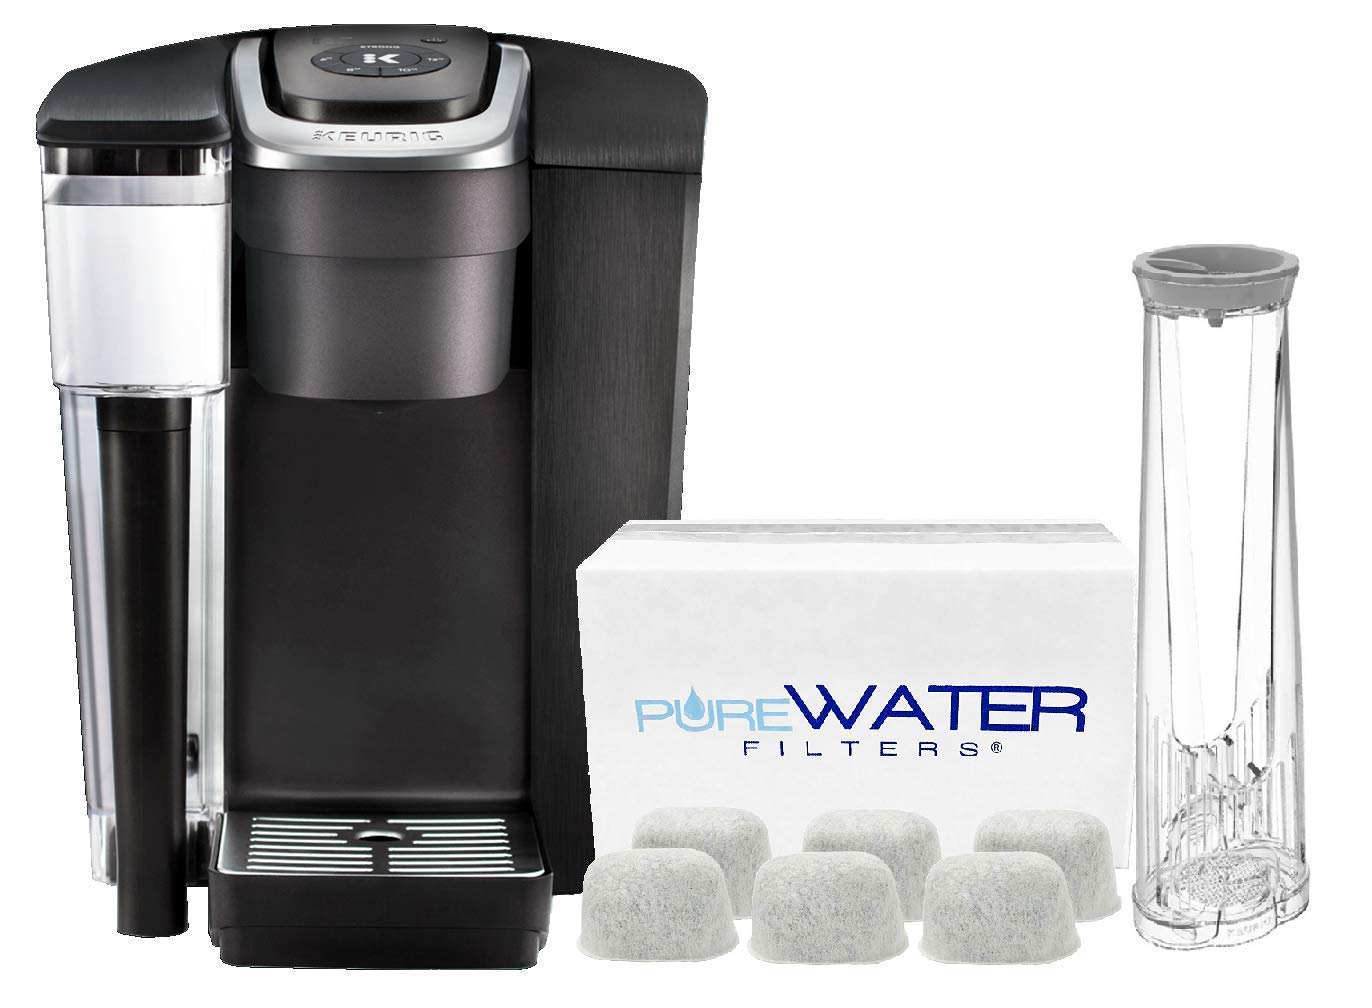 PureWater Filters bundle K1500 Commercial Single Serve ...